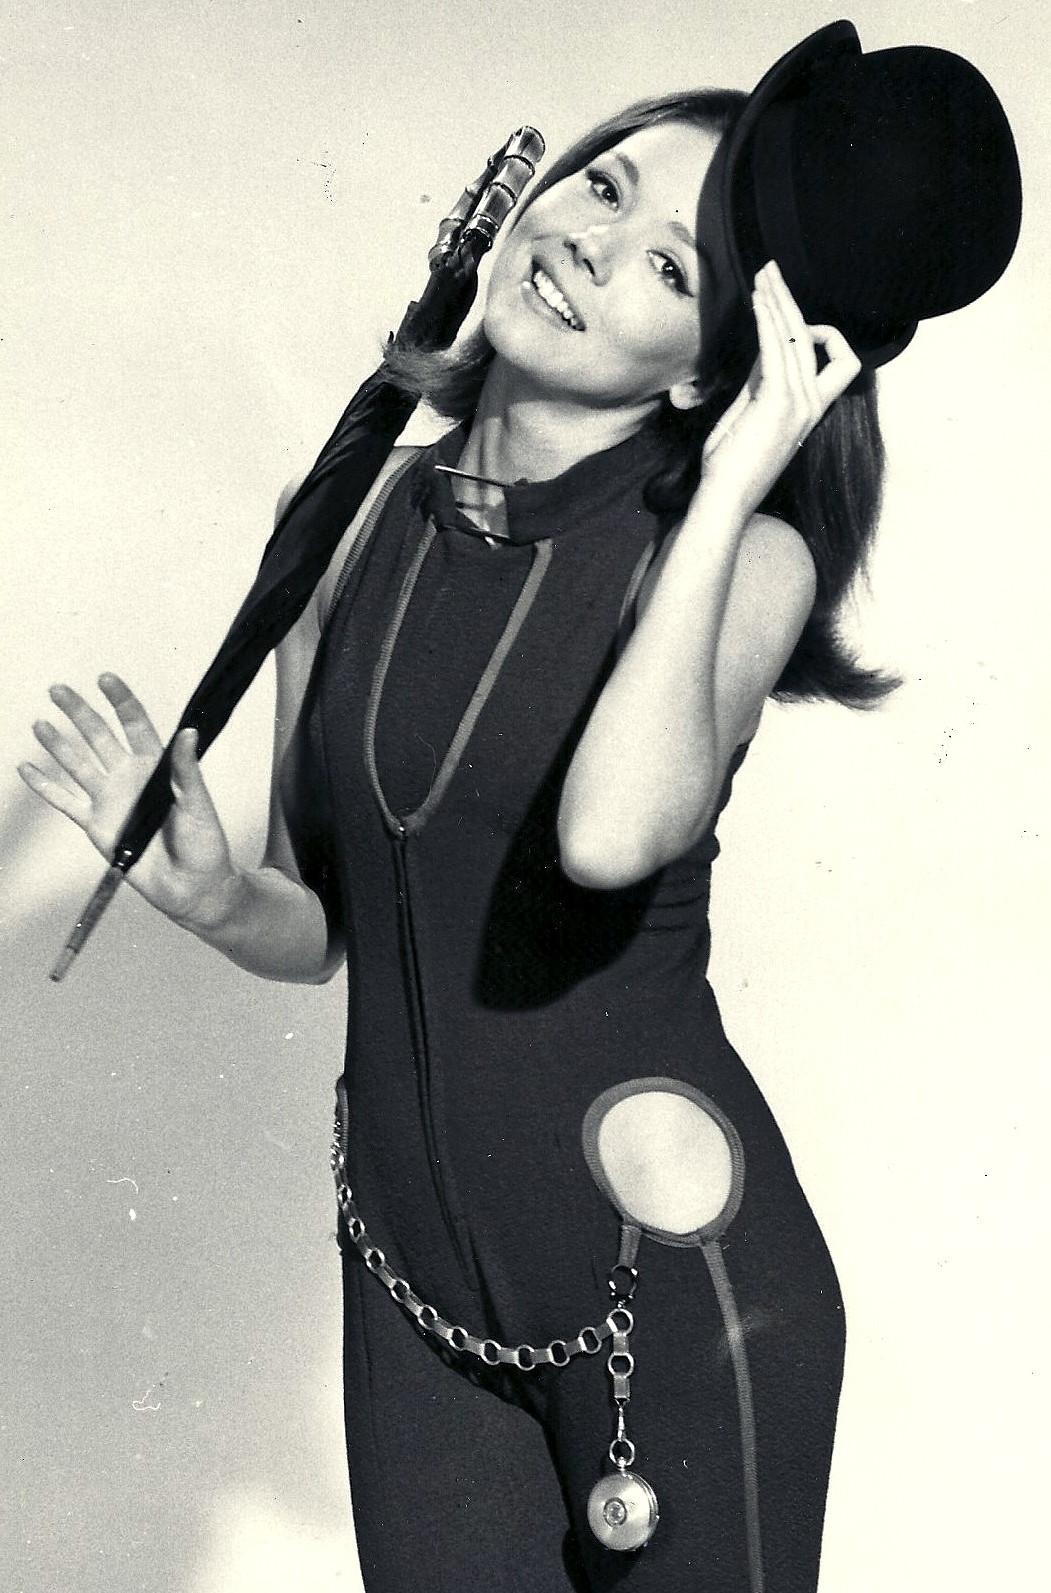 Doctor Ojiplático. Diana Rigg - Mrs Peel